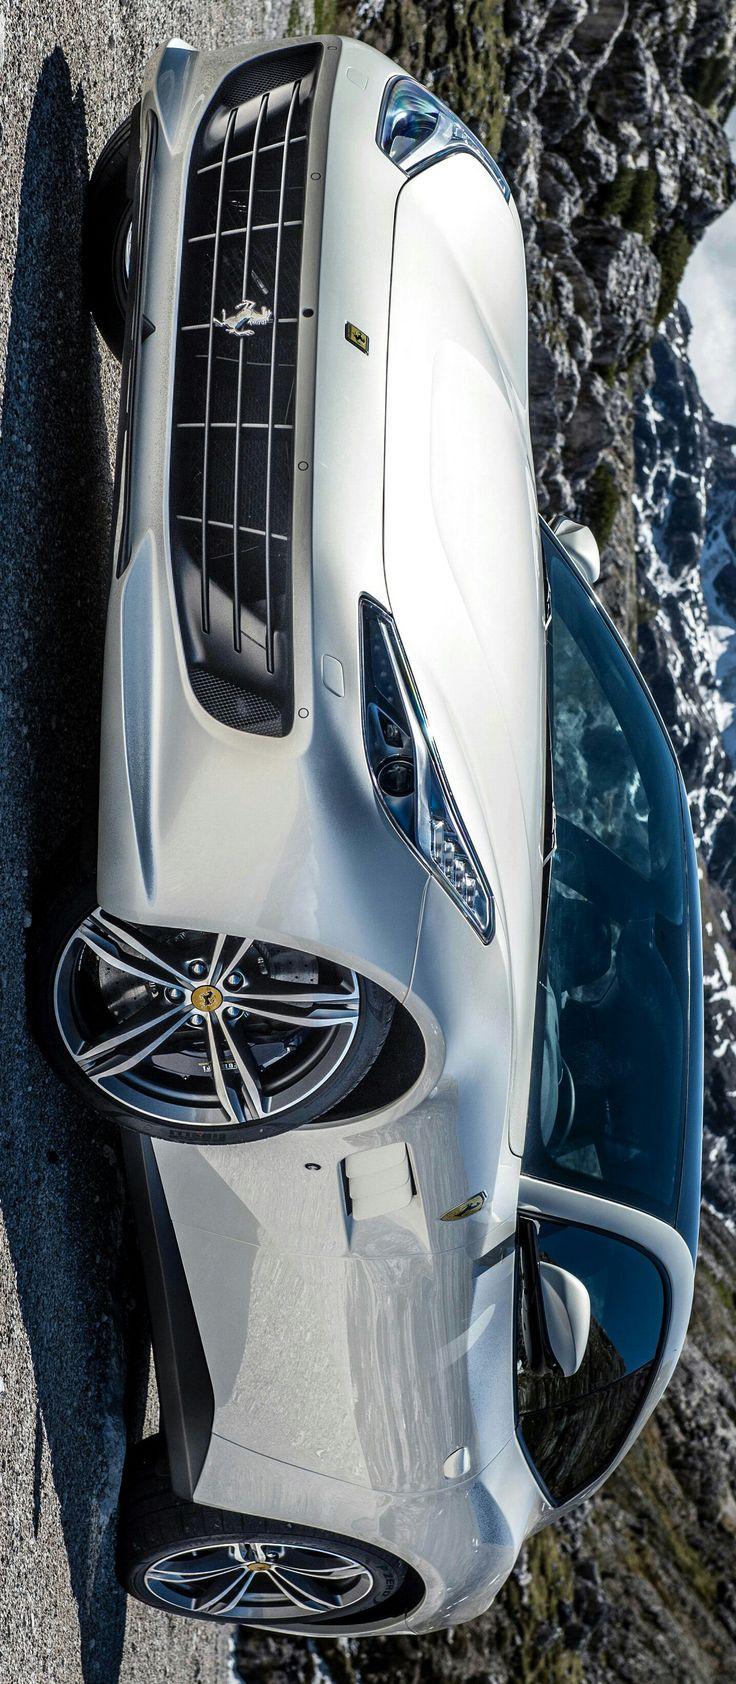 2017 Ferrari GTC4 LUSSO by Levon